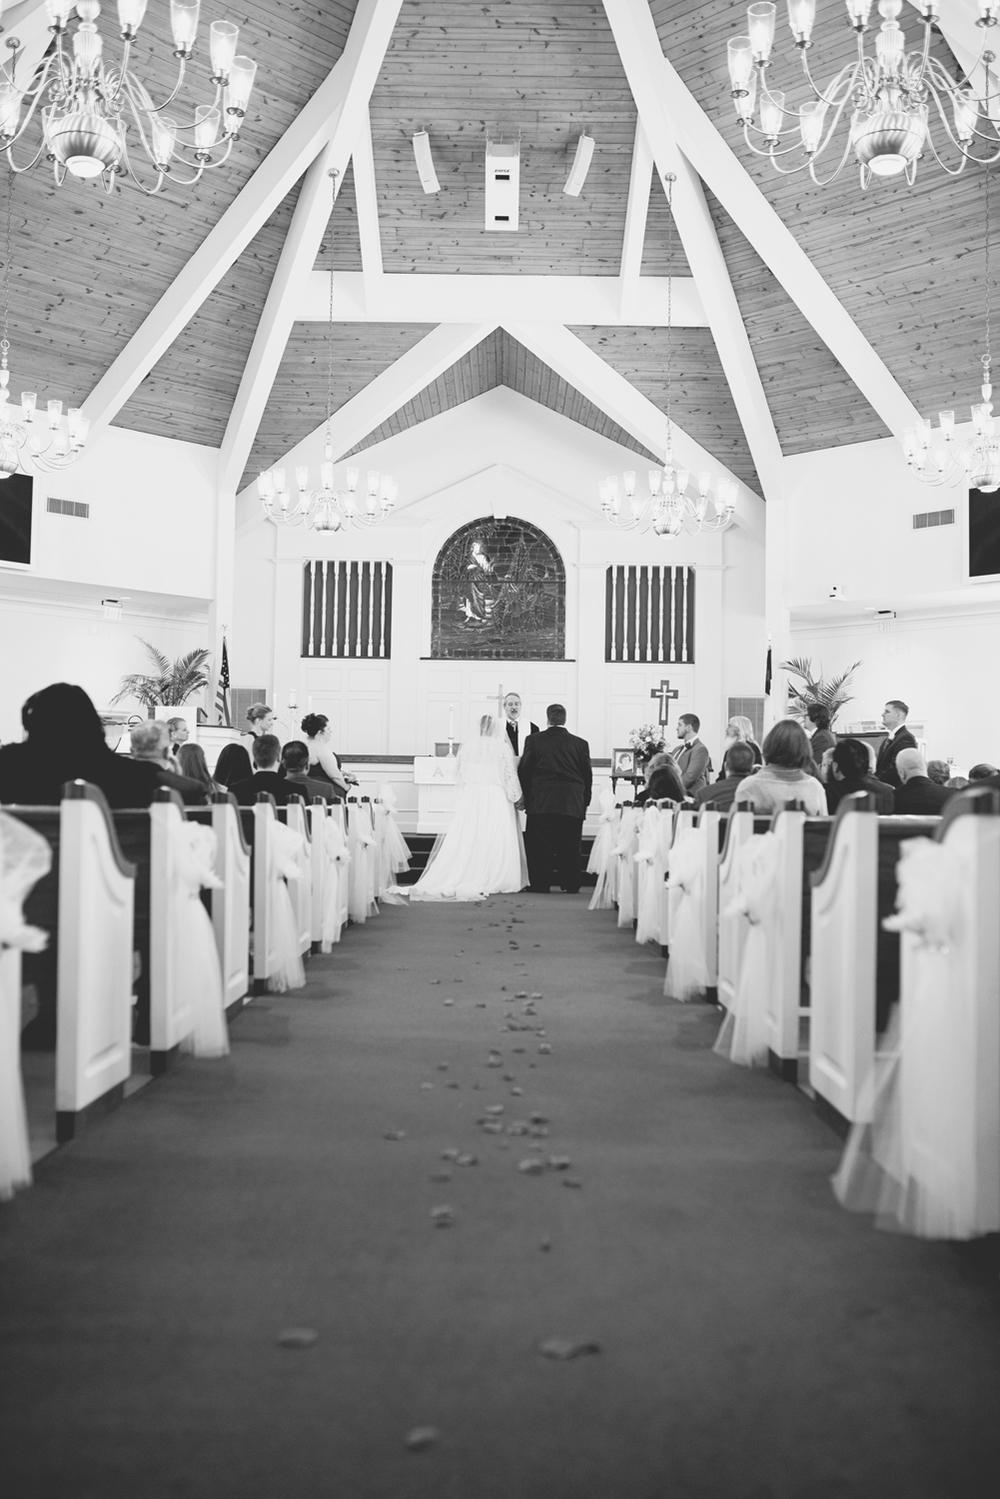 Church wedding ceremony | Winter wedding | Black and white